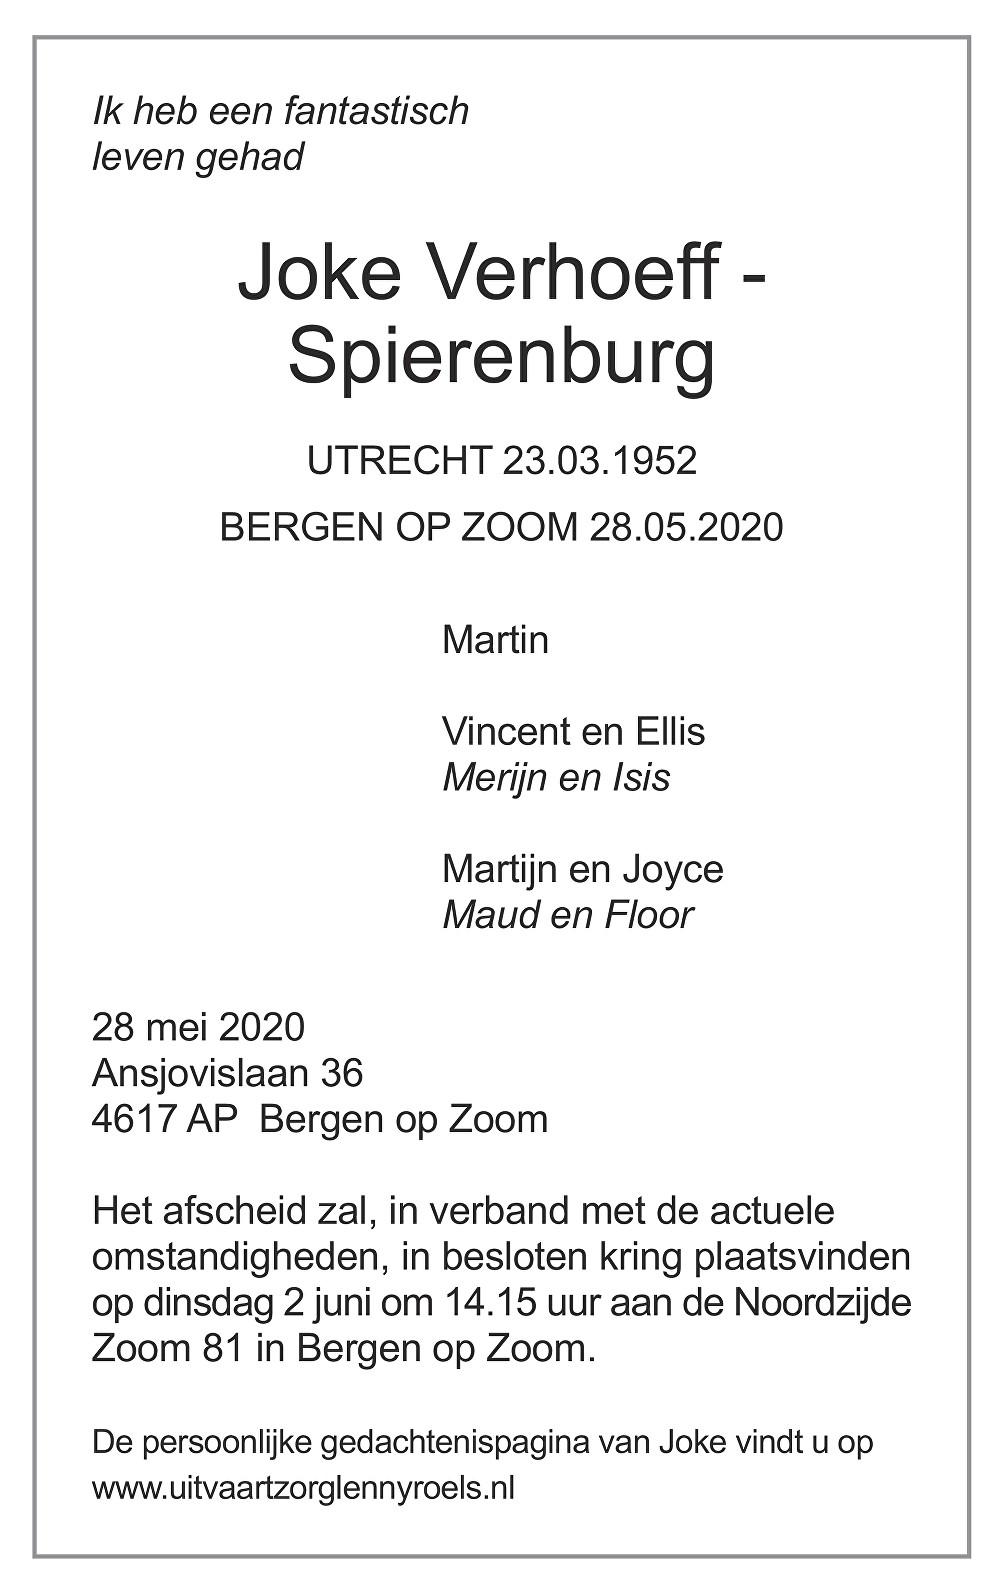 Joke Verhoeff Death notice